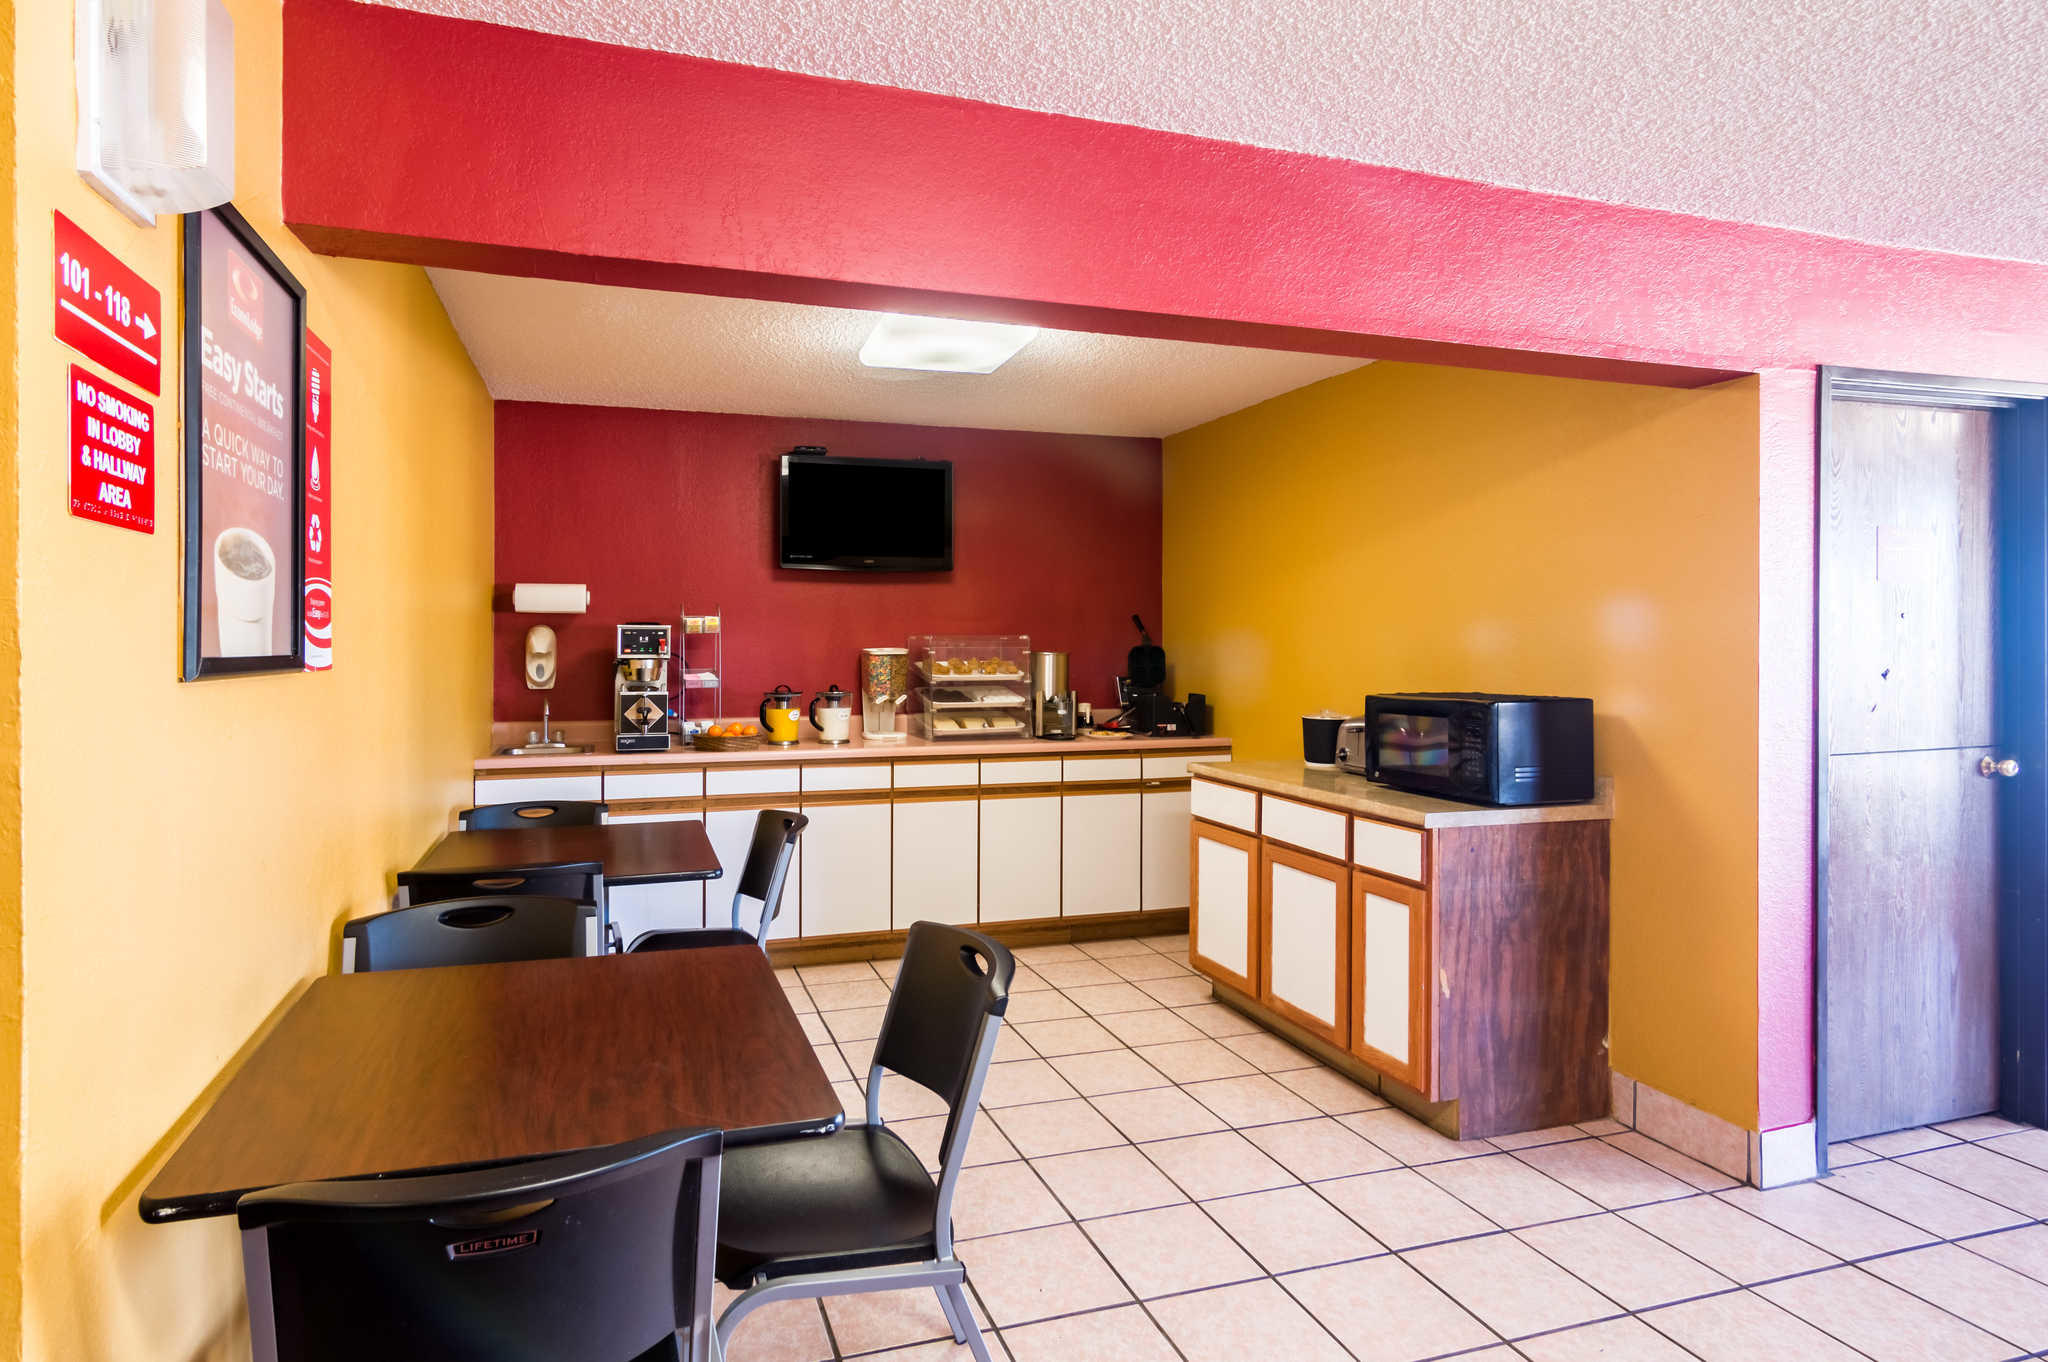 Econo Lodge image 7